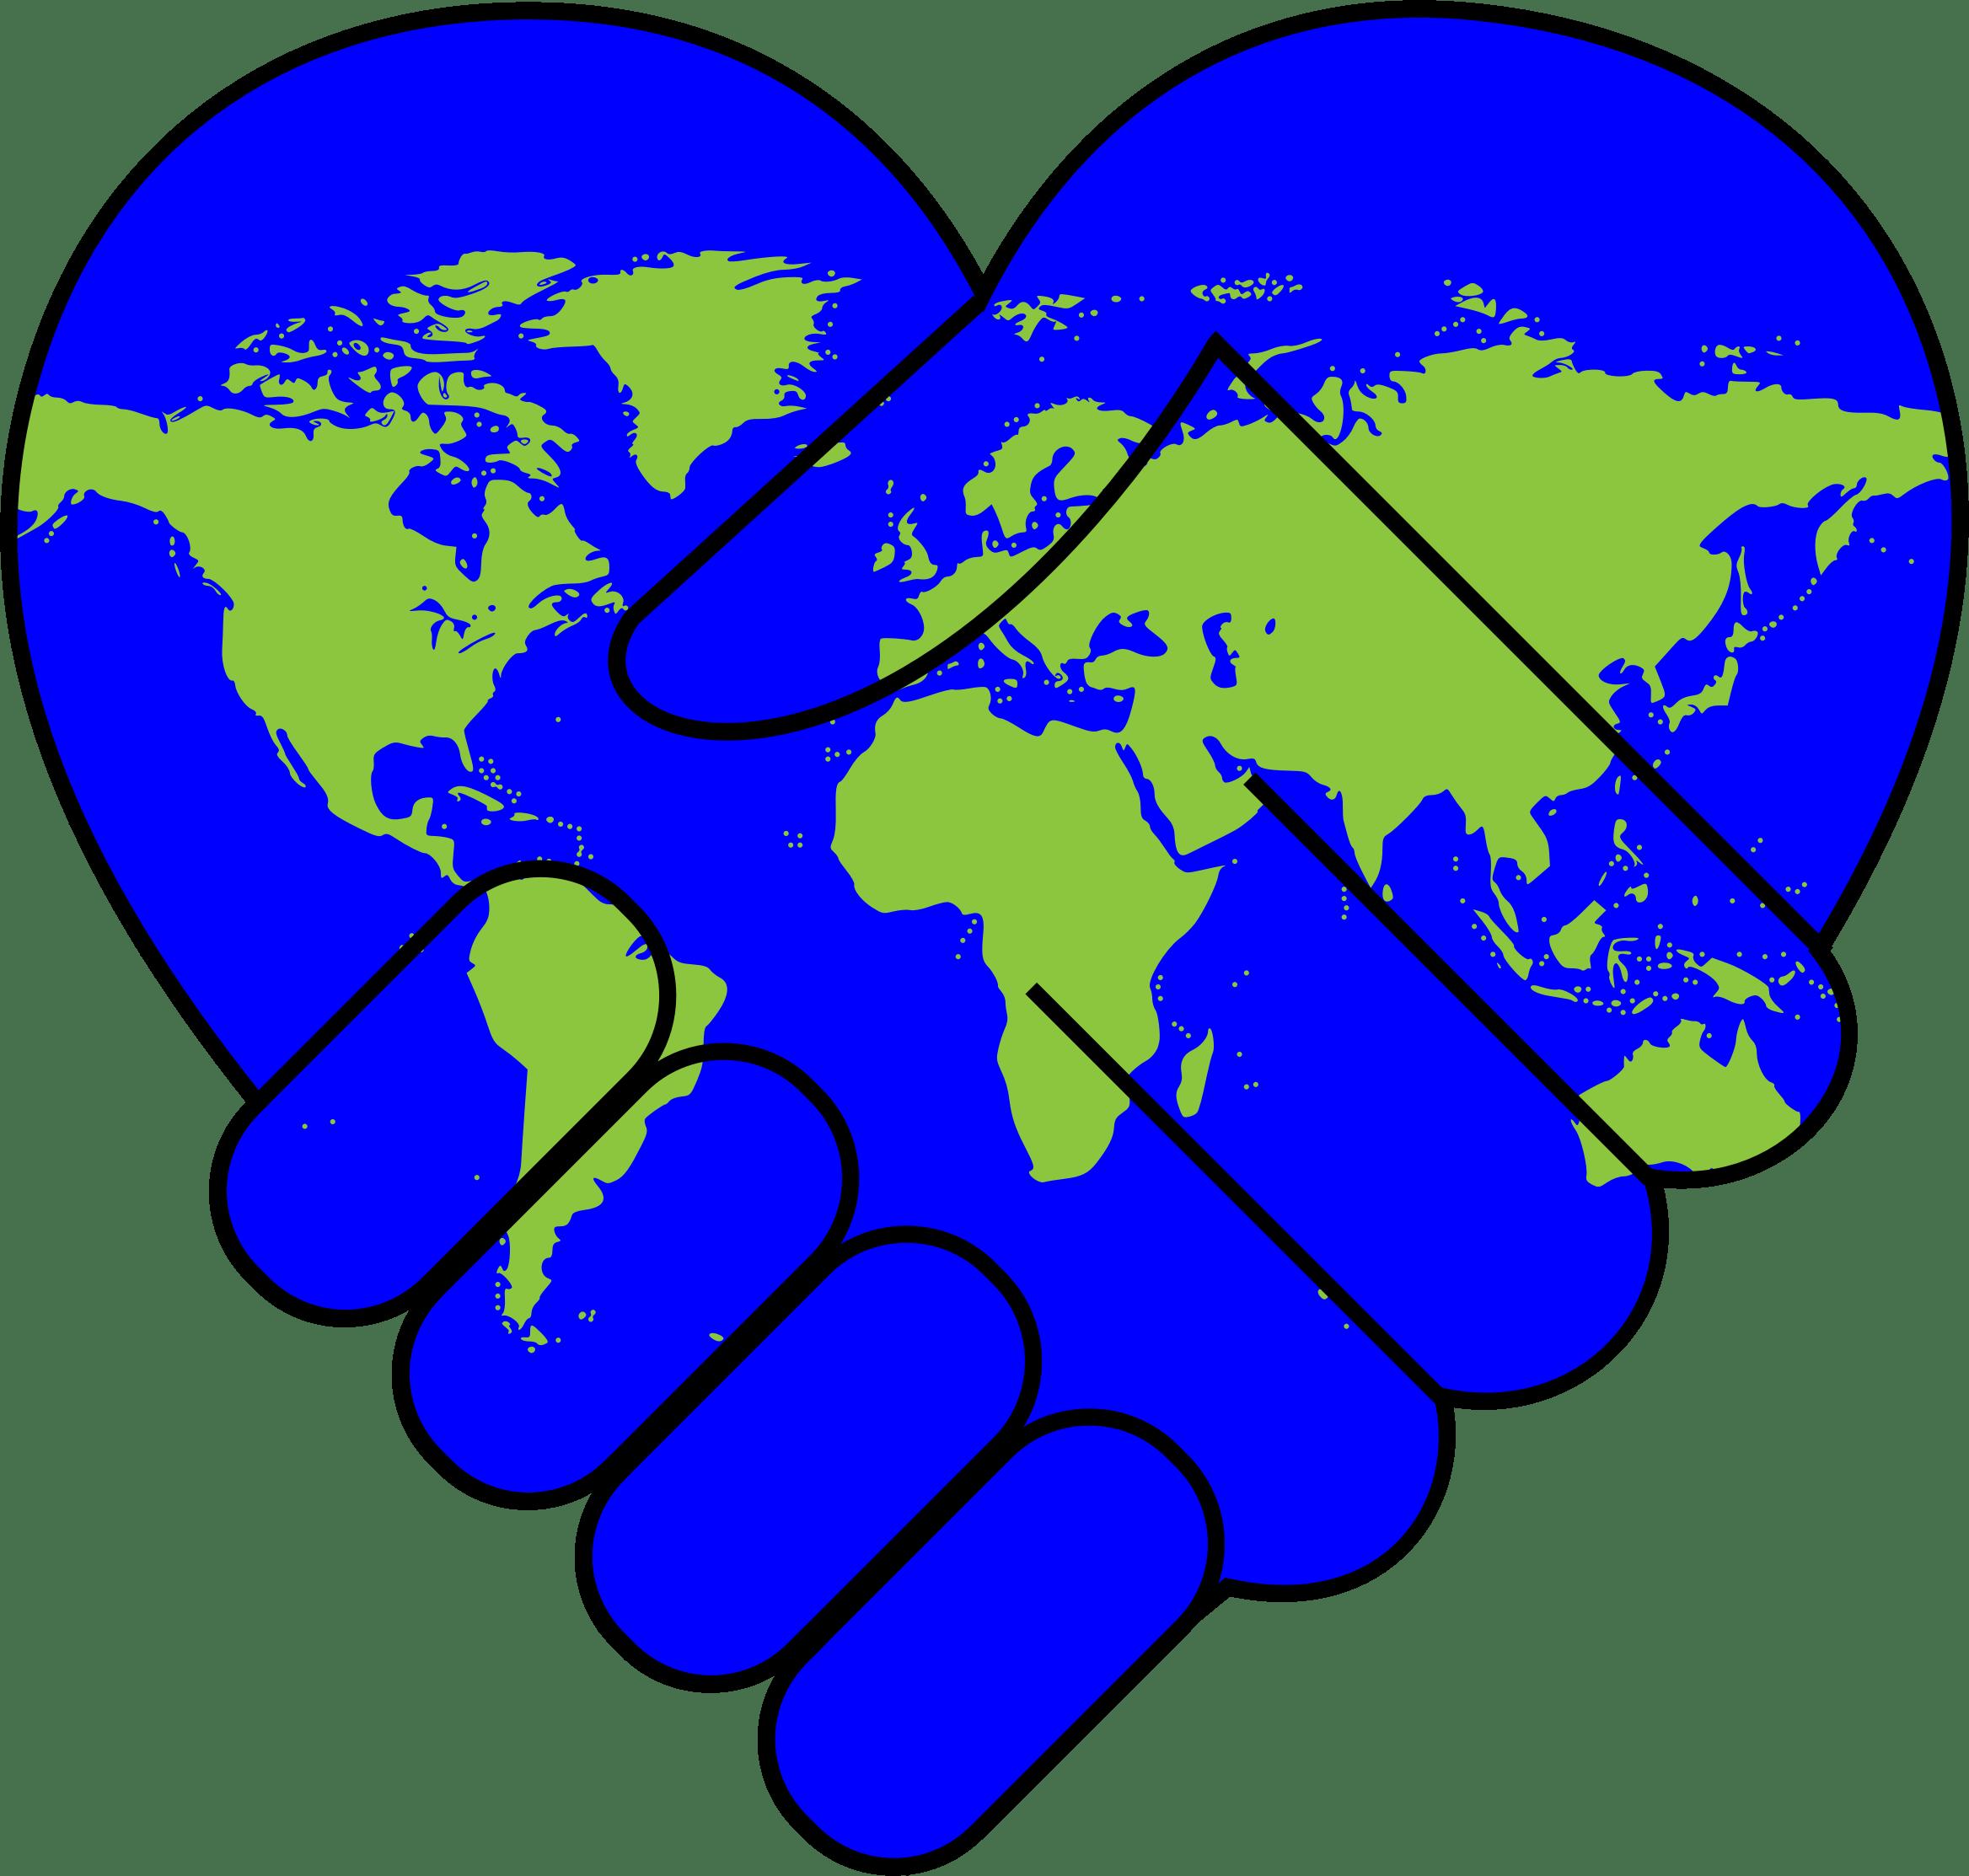 Love rickgroves net peace. Clipart world peaceful world